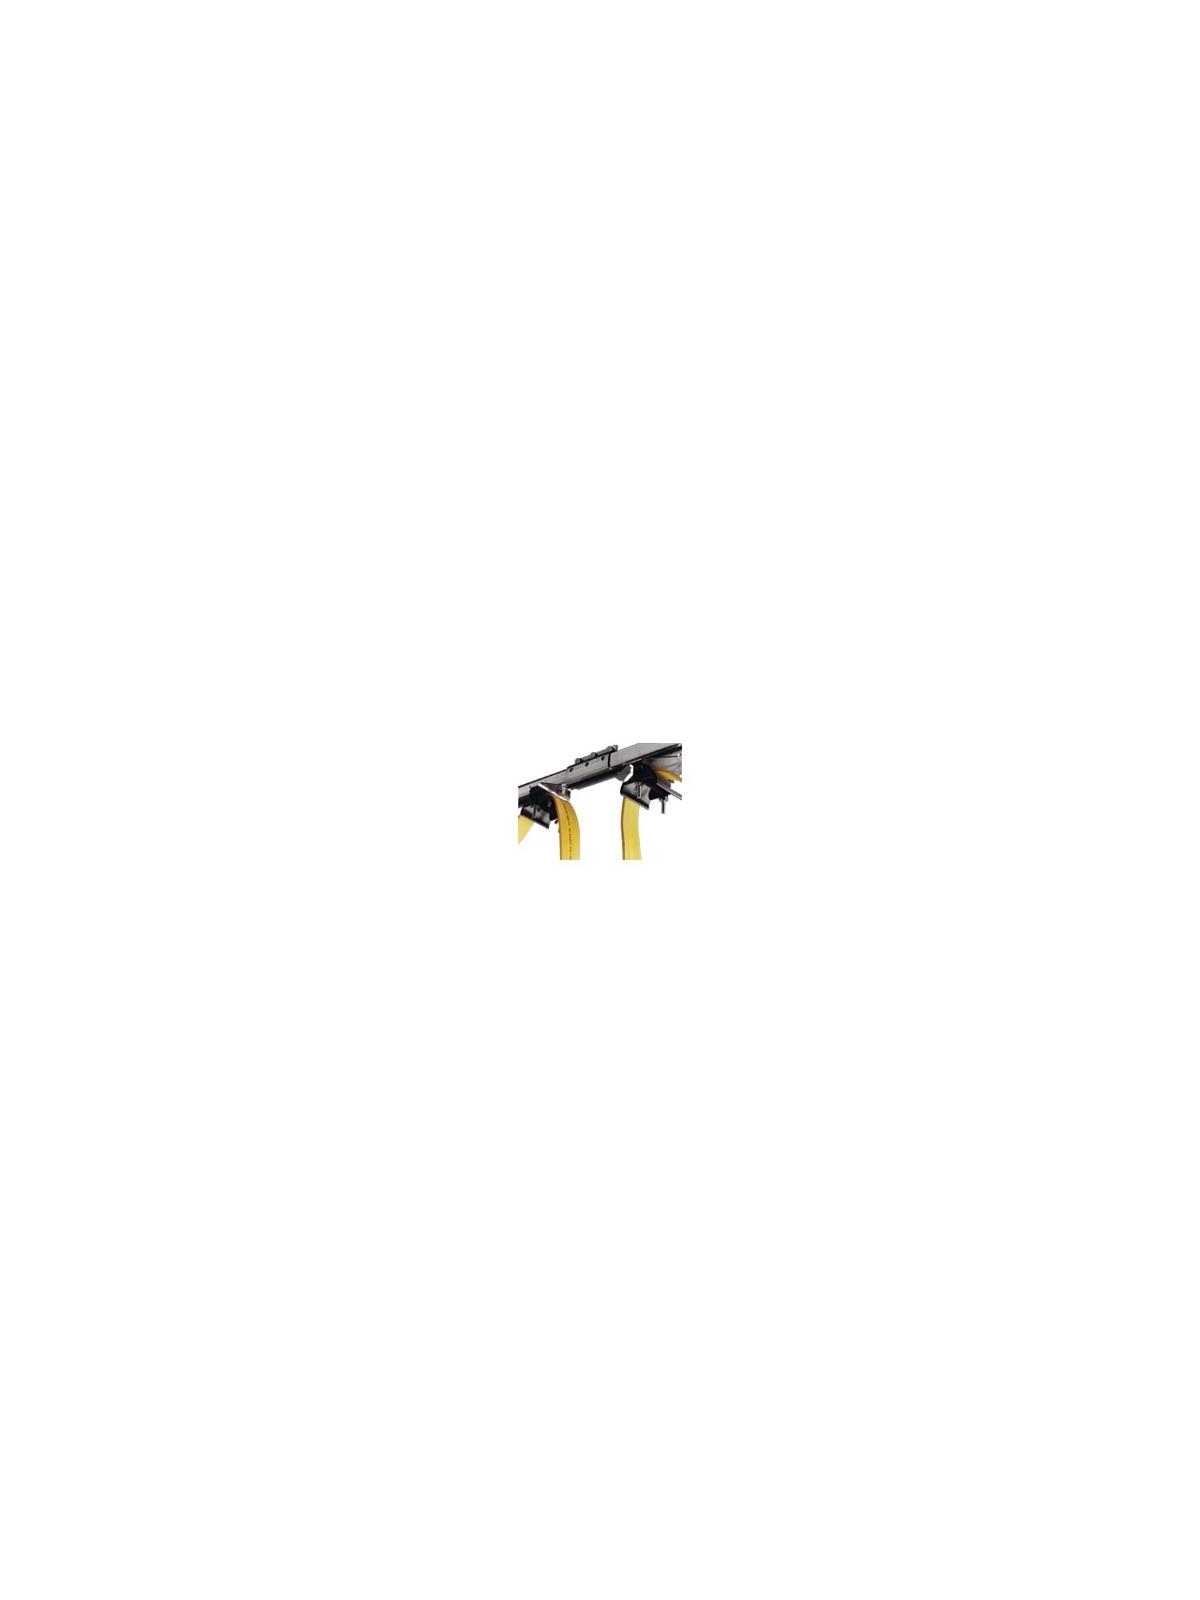 Flat Festoon Cable   Motion Savers Inc.   877-832-4154